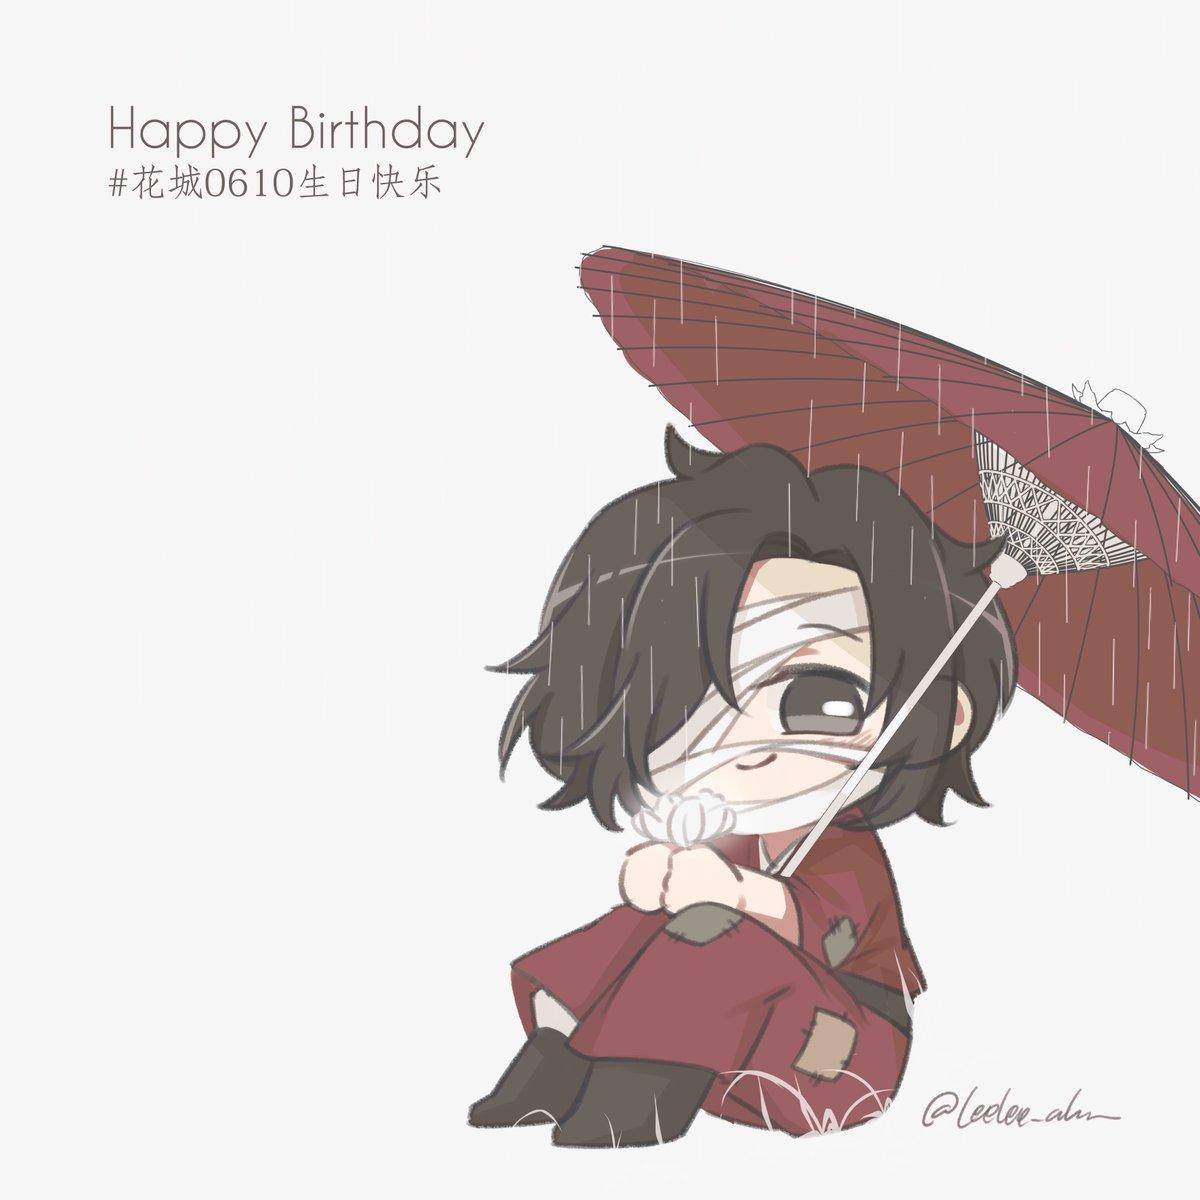 Happy birthday hong-er ❤️ #花城0610生日快乐